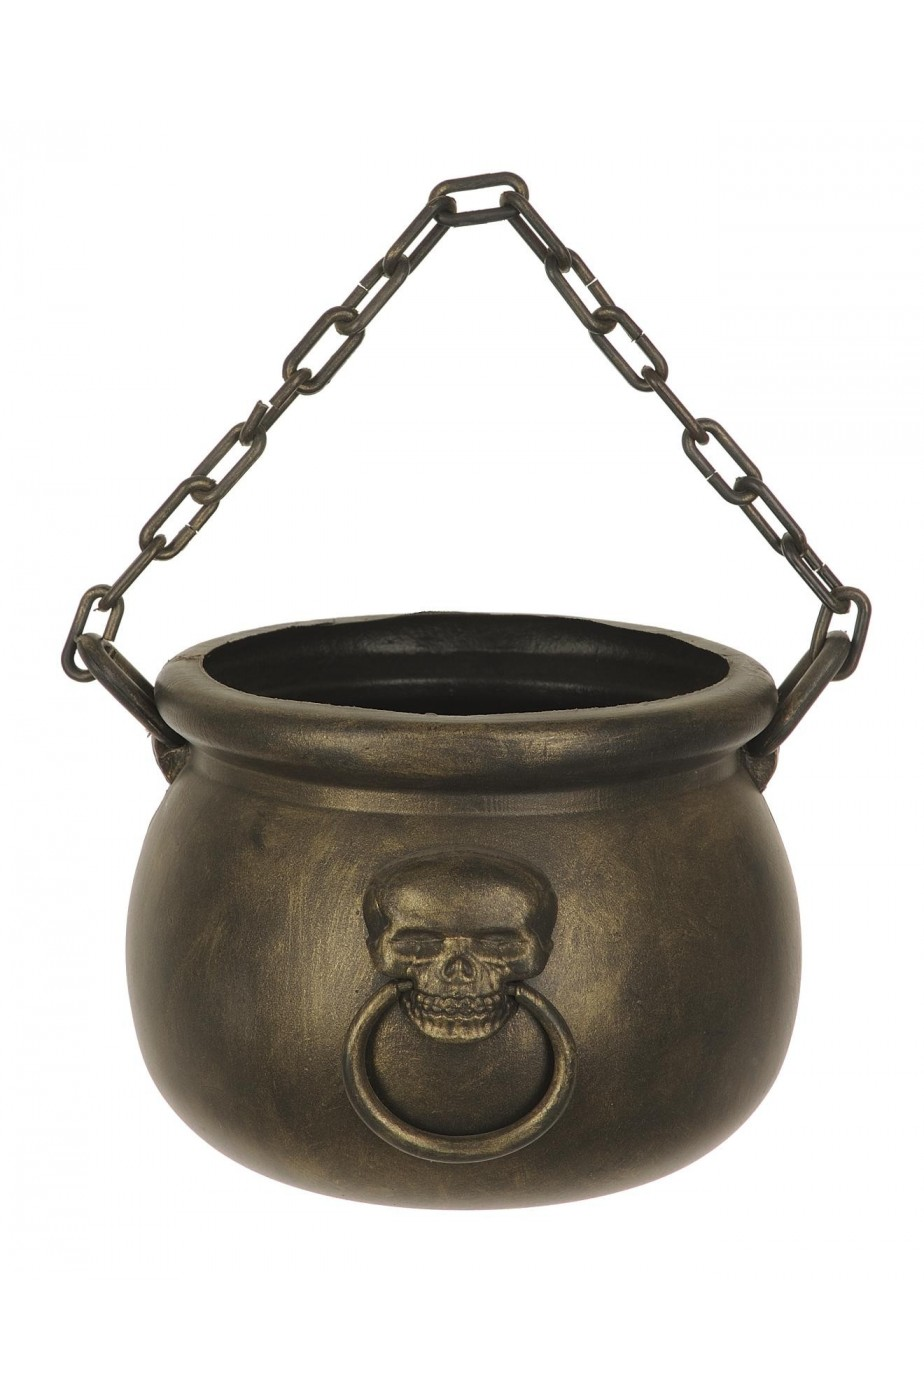 Calderone strega pirati 20cm diametro con teschio